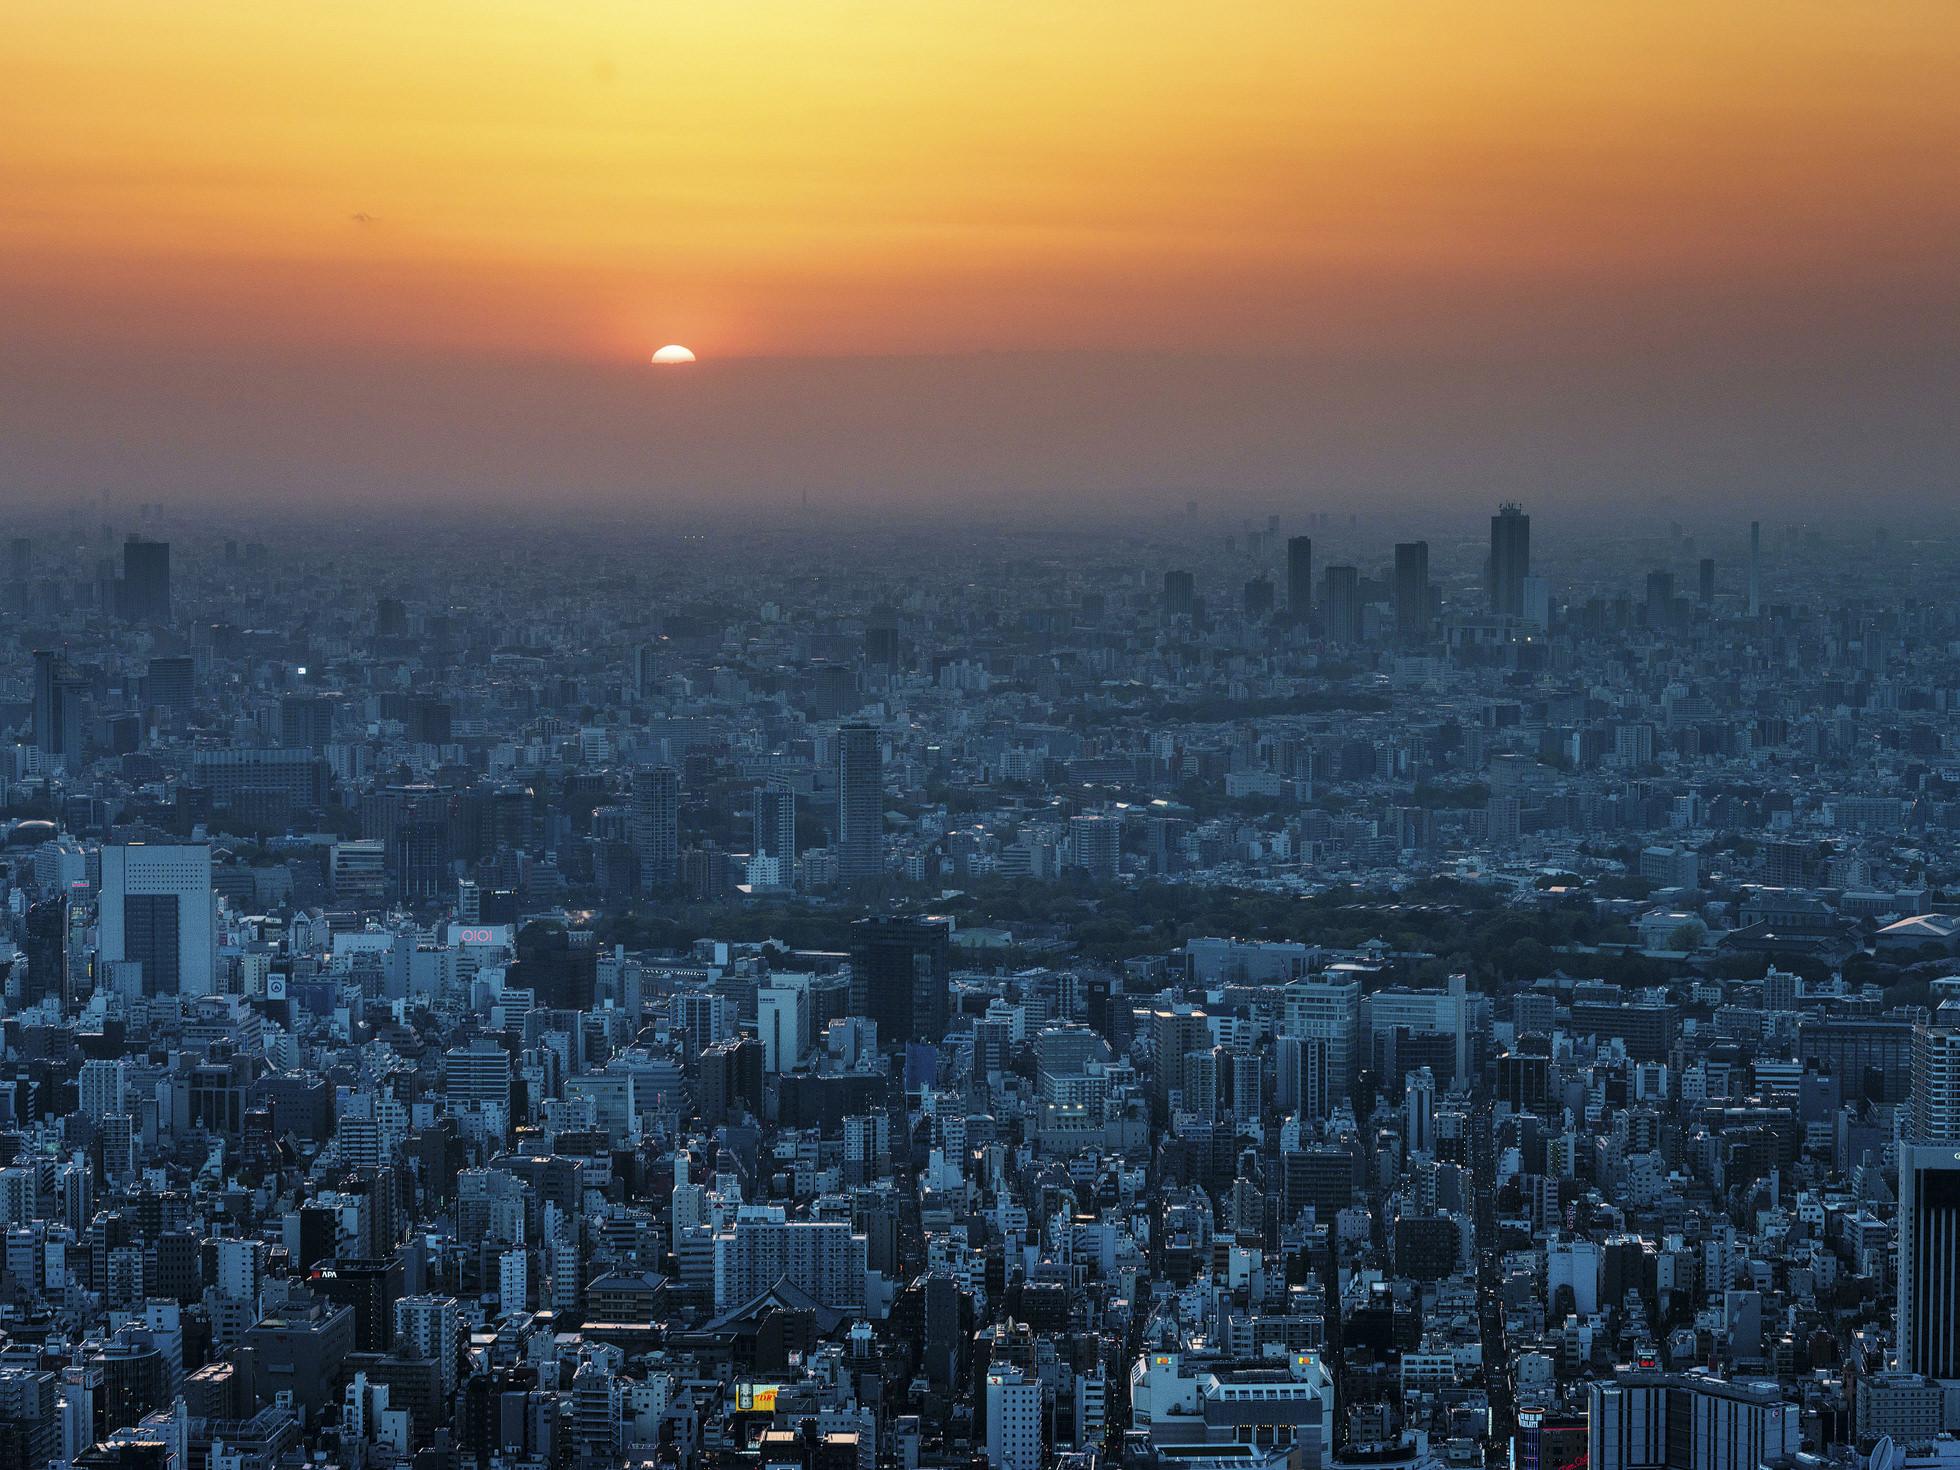 63 Japan Street Photography with Fujifilm GFX